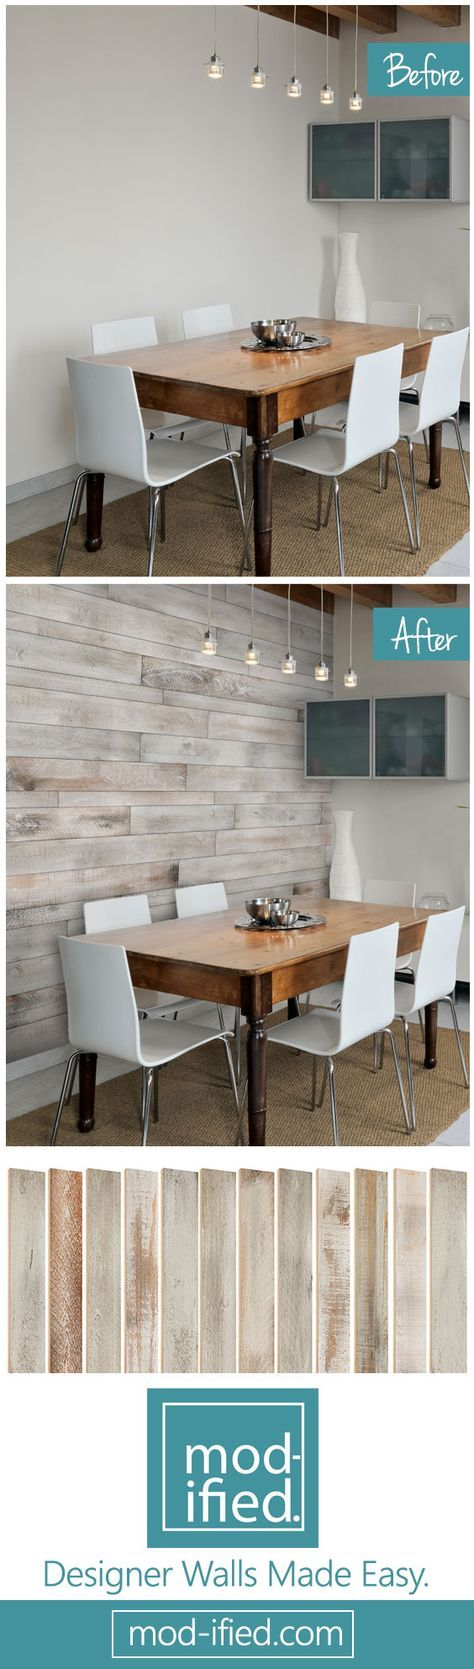 55 trendy kitchen wall paper ideas sticks | Bedroom ...